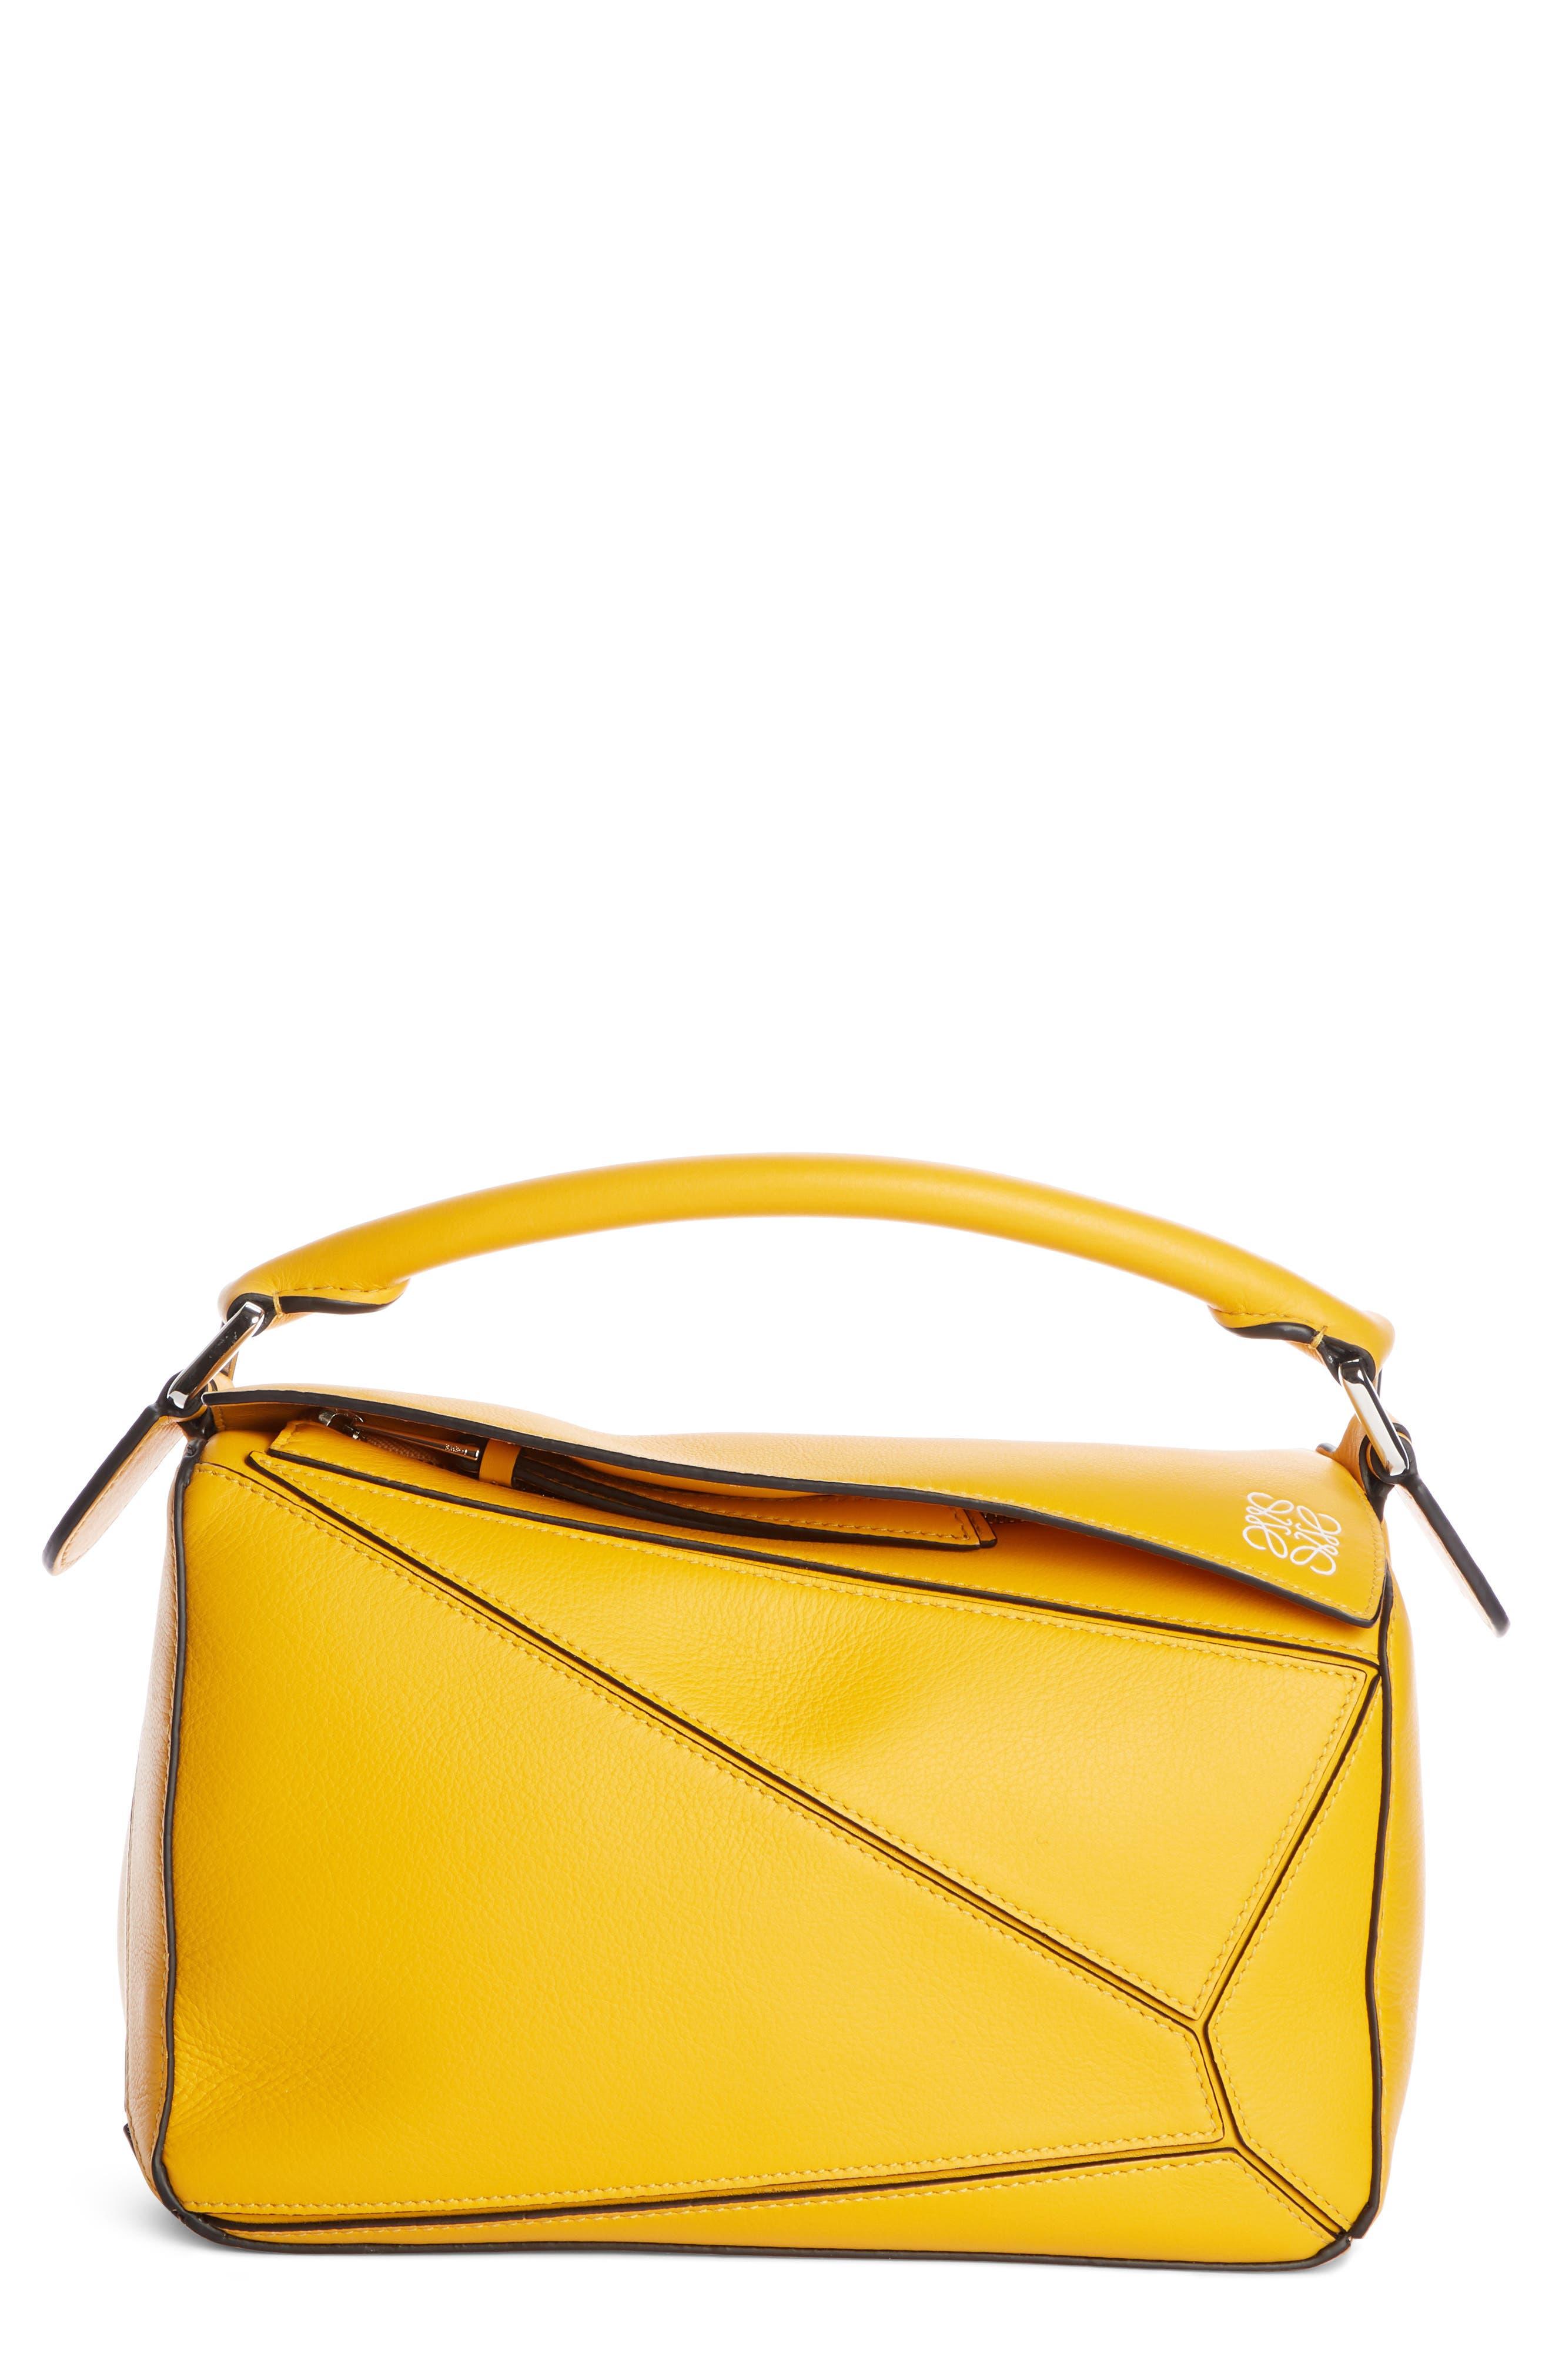 LOEWE,                             Small Puzzle Shoulder Bag,                             Main thumbnail 1, color,                             YELLOW MANGO